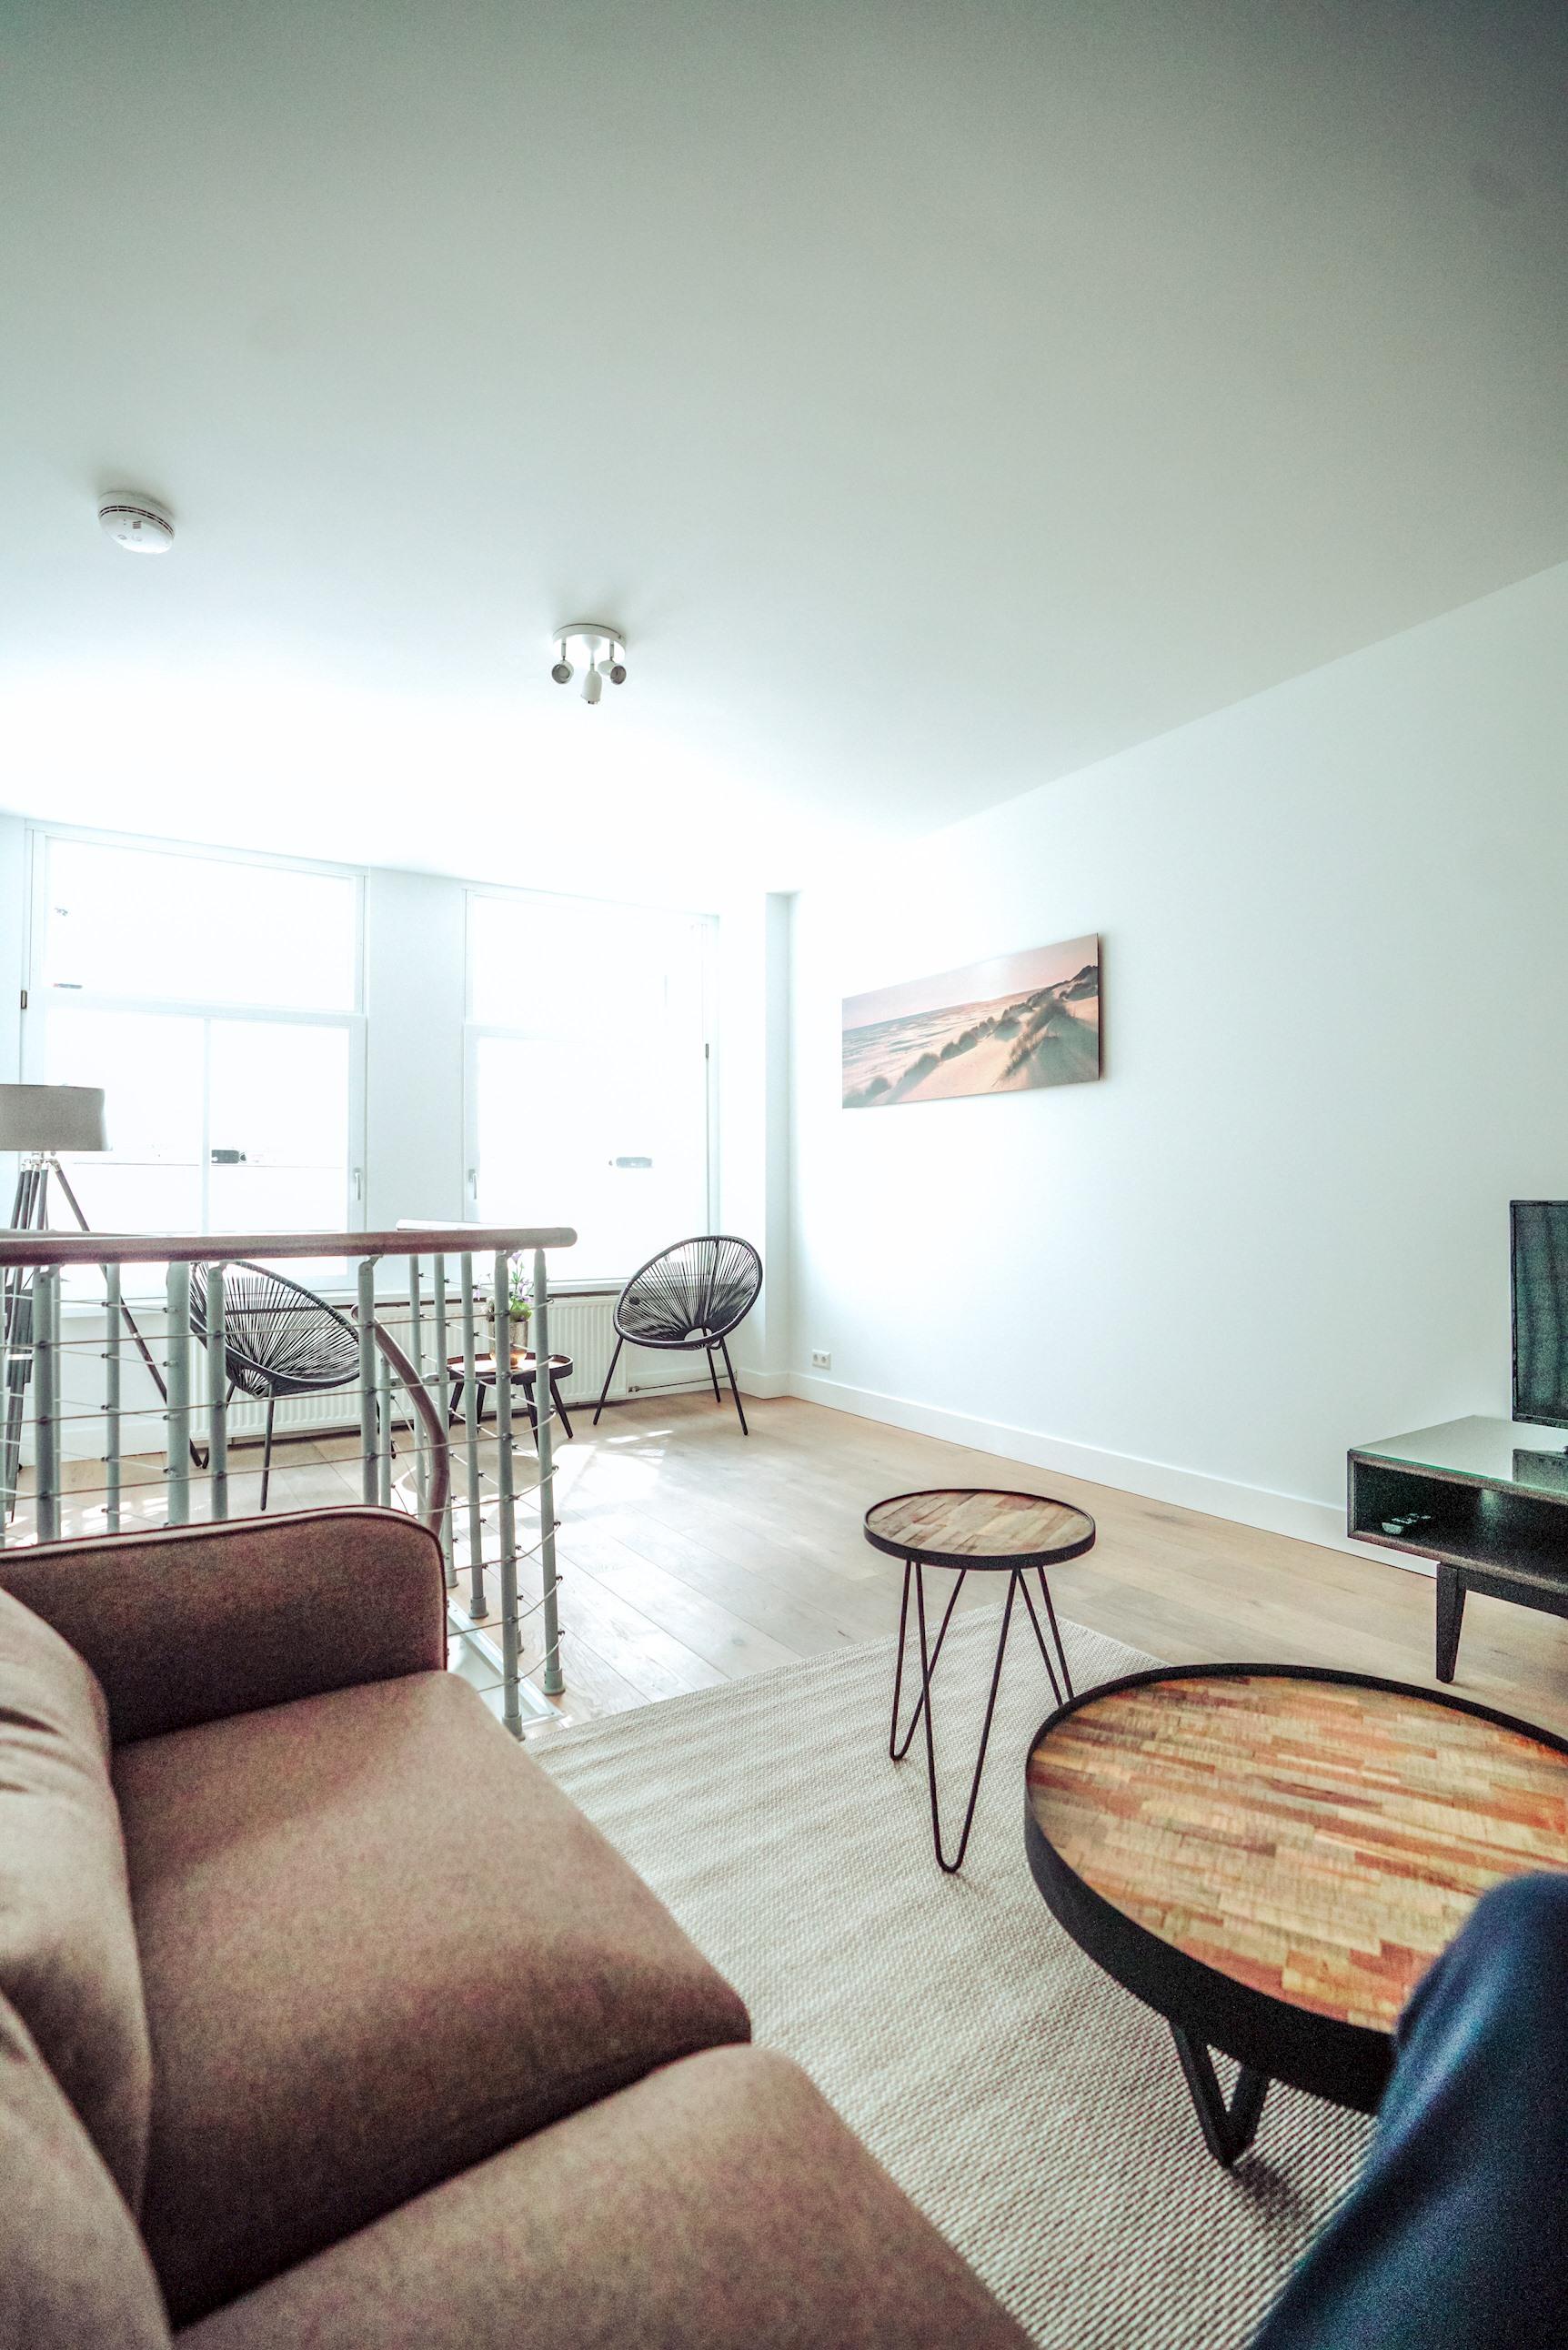 Amsterdam Apartments Leidsesquare First Floor Duplex photo 17035152